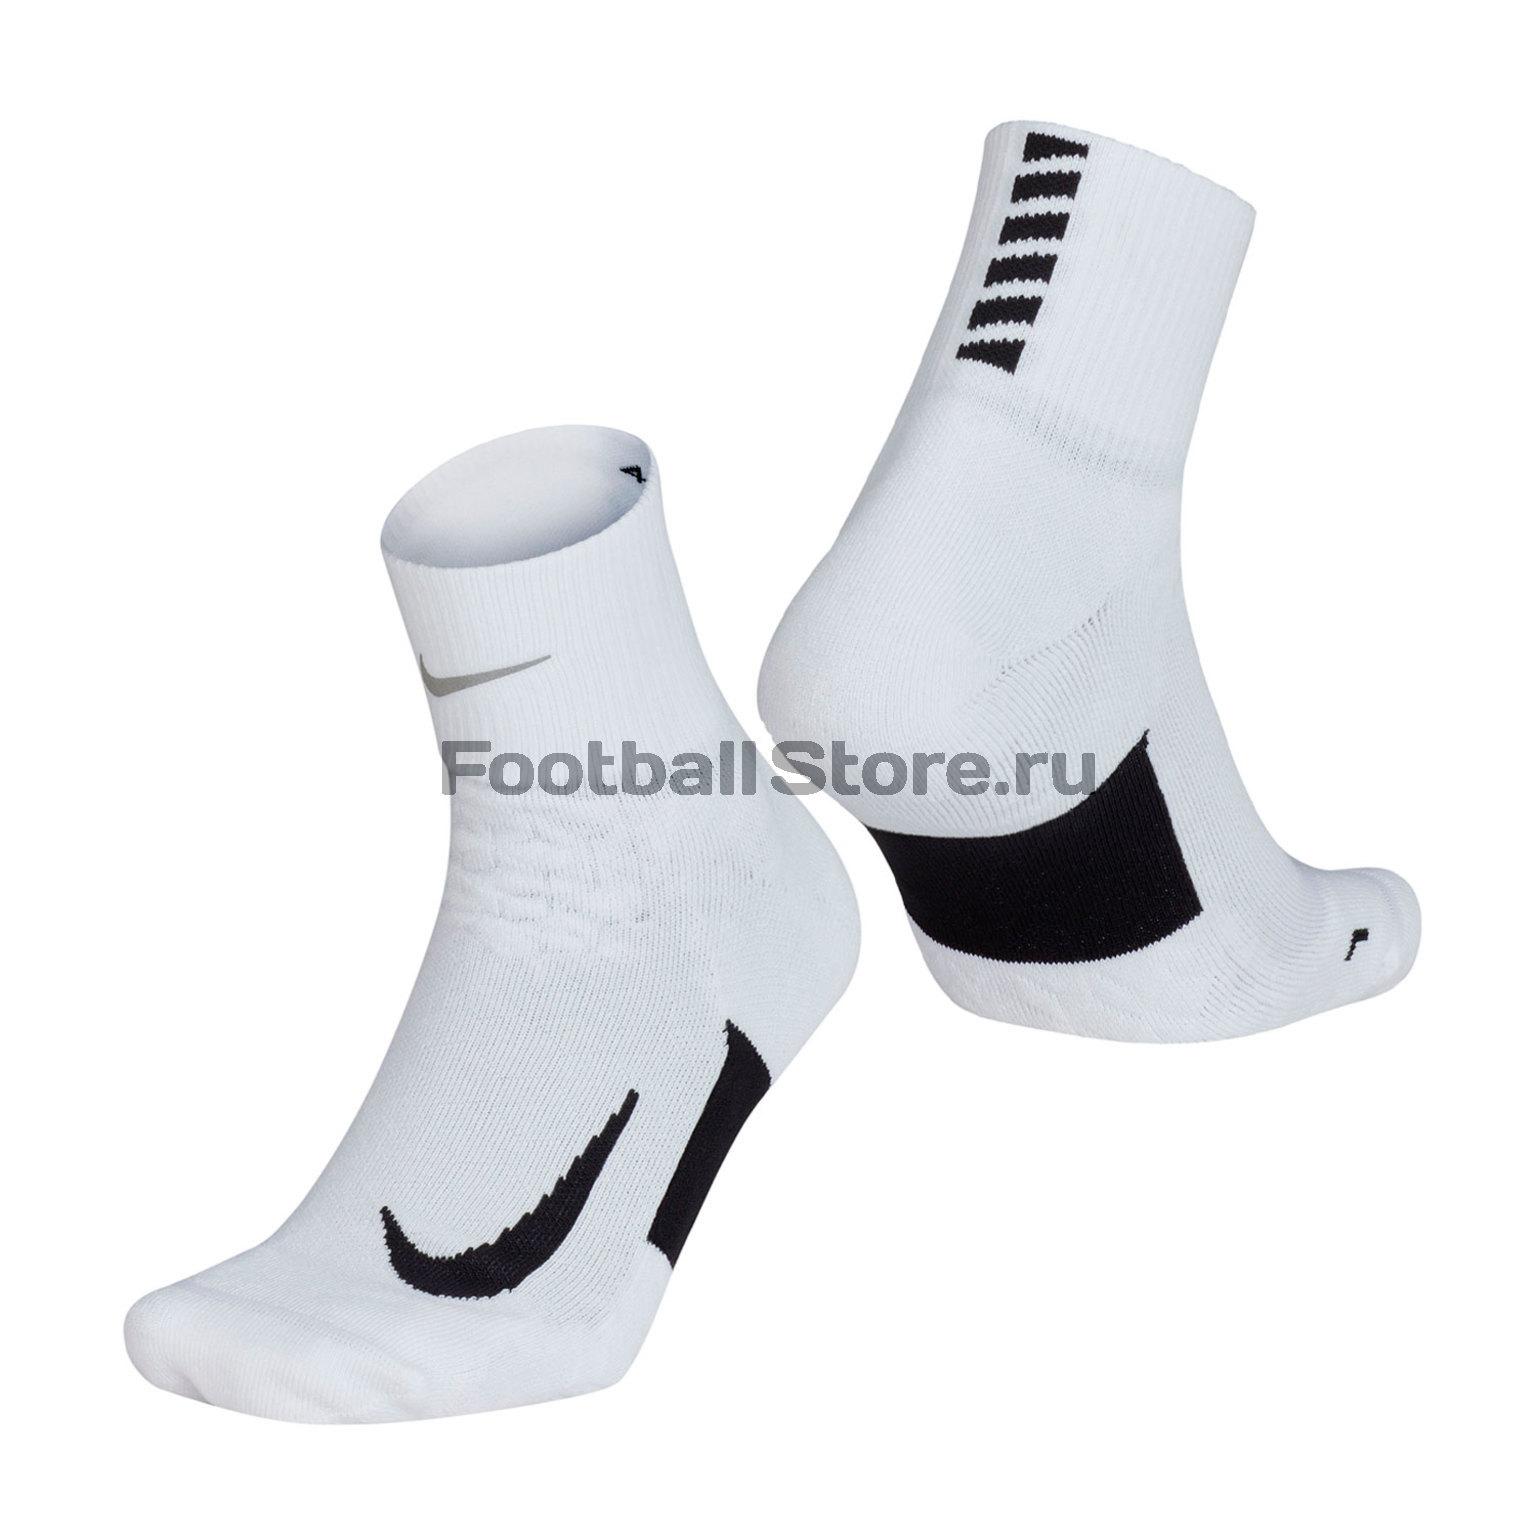 Носки Nike Elite Cushion Quarter Running Sock SX5463-101 носки беговые nike elite running cushion crw page 4